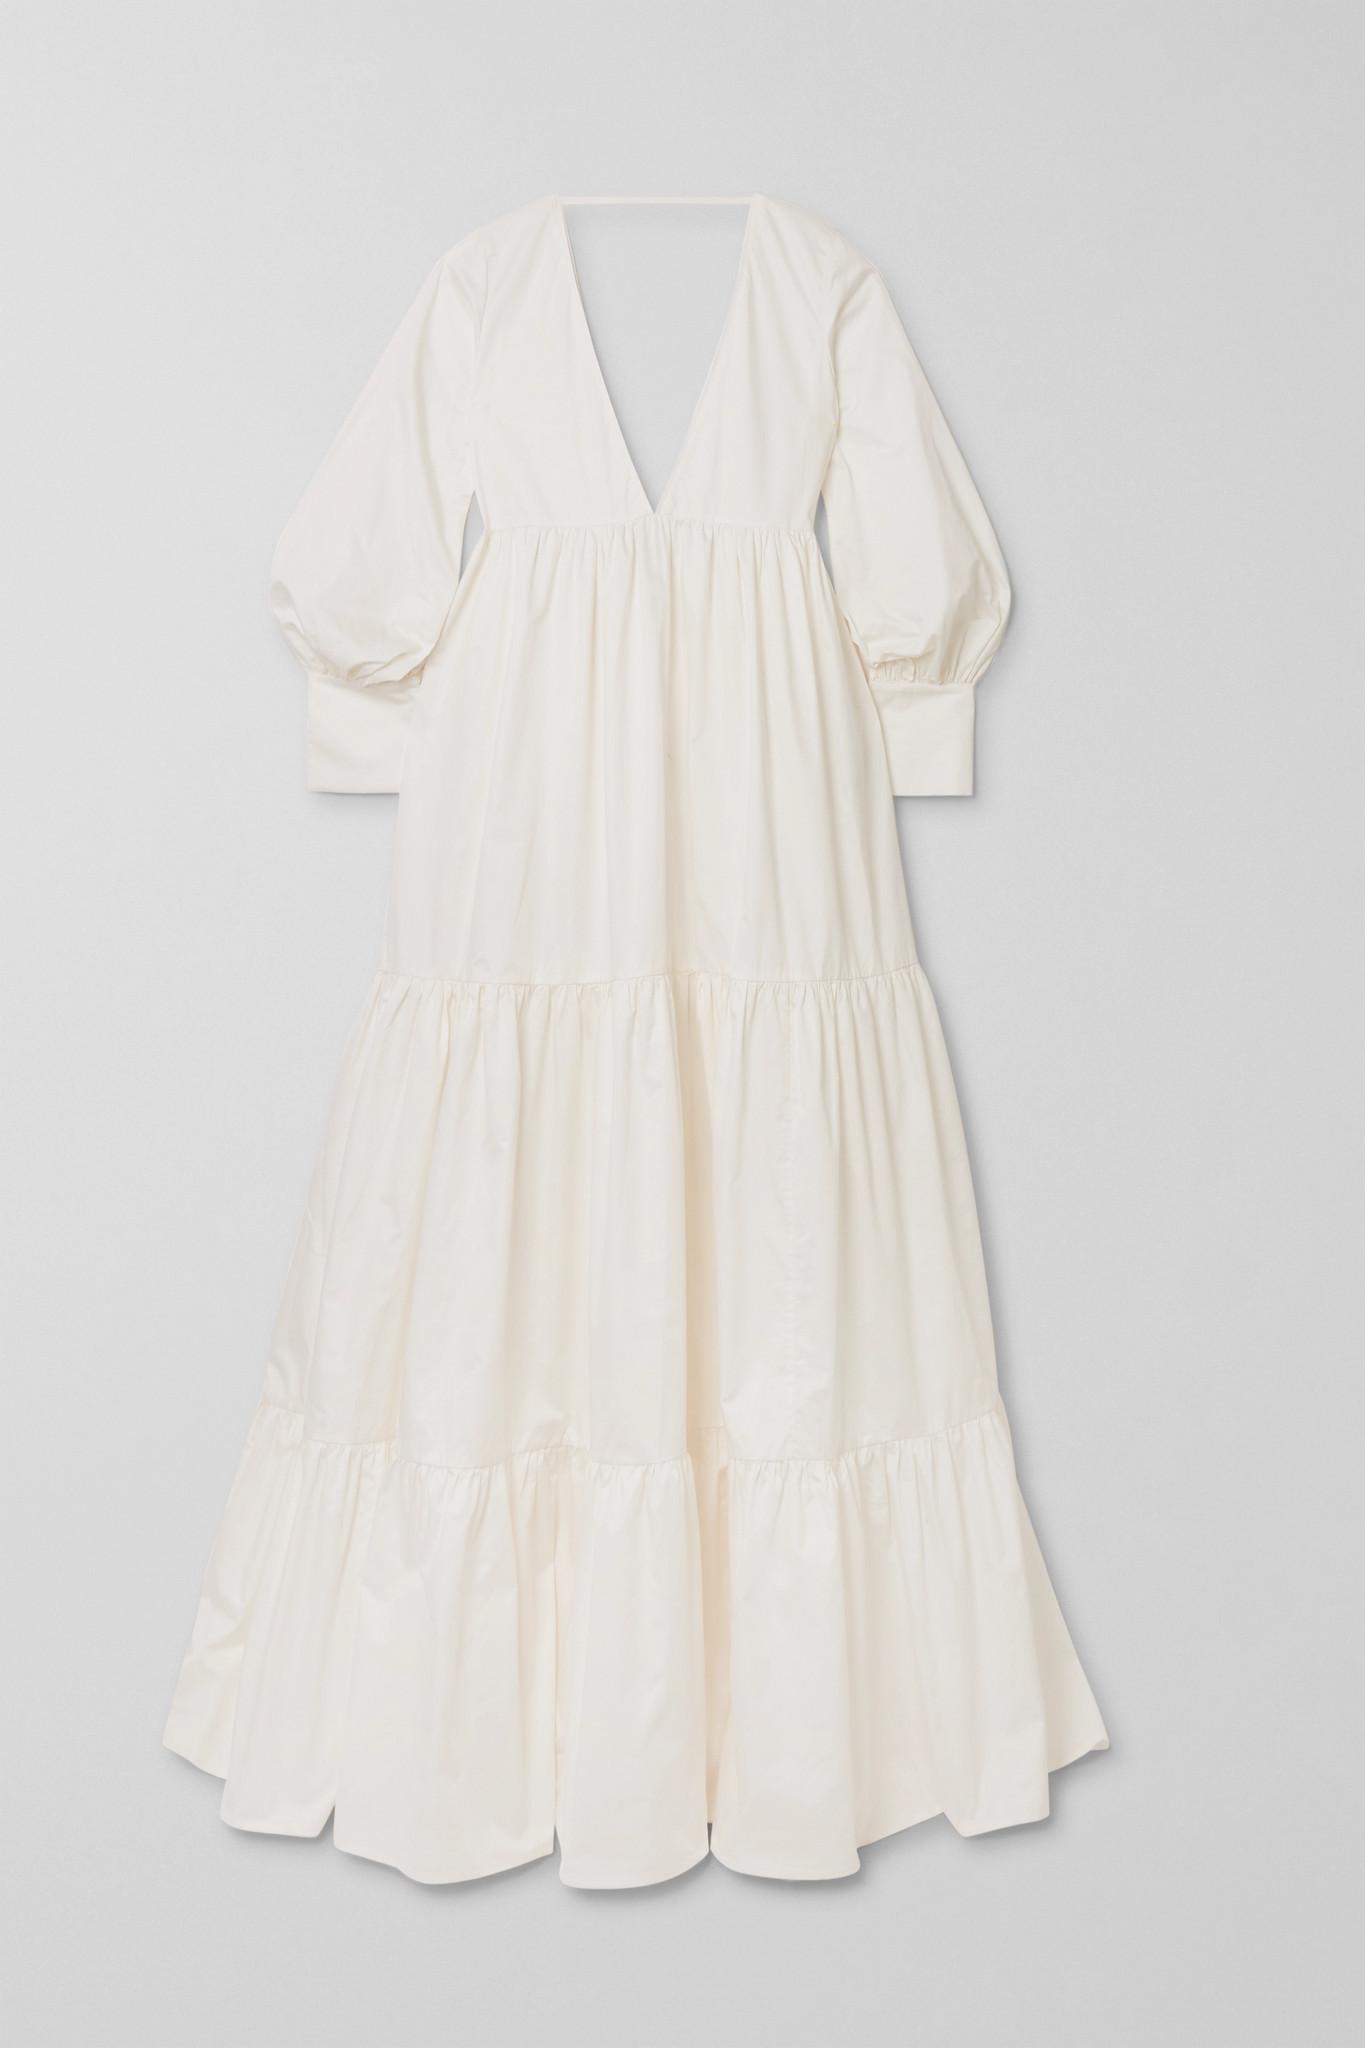 KALITA - Circle Day 层接式纯棉府绸超长连衣裙 - 白色 - x small